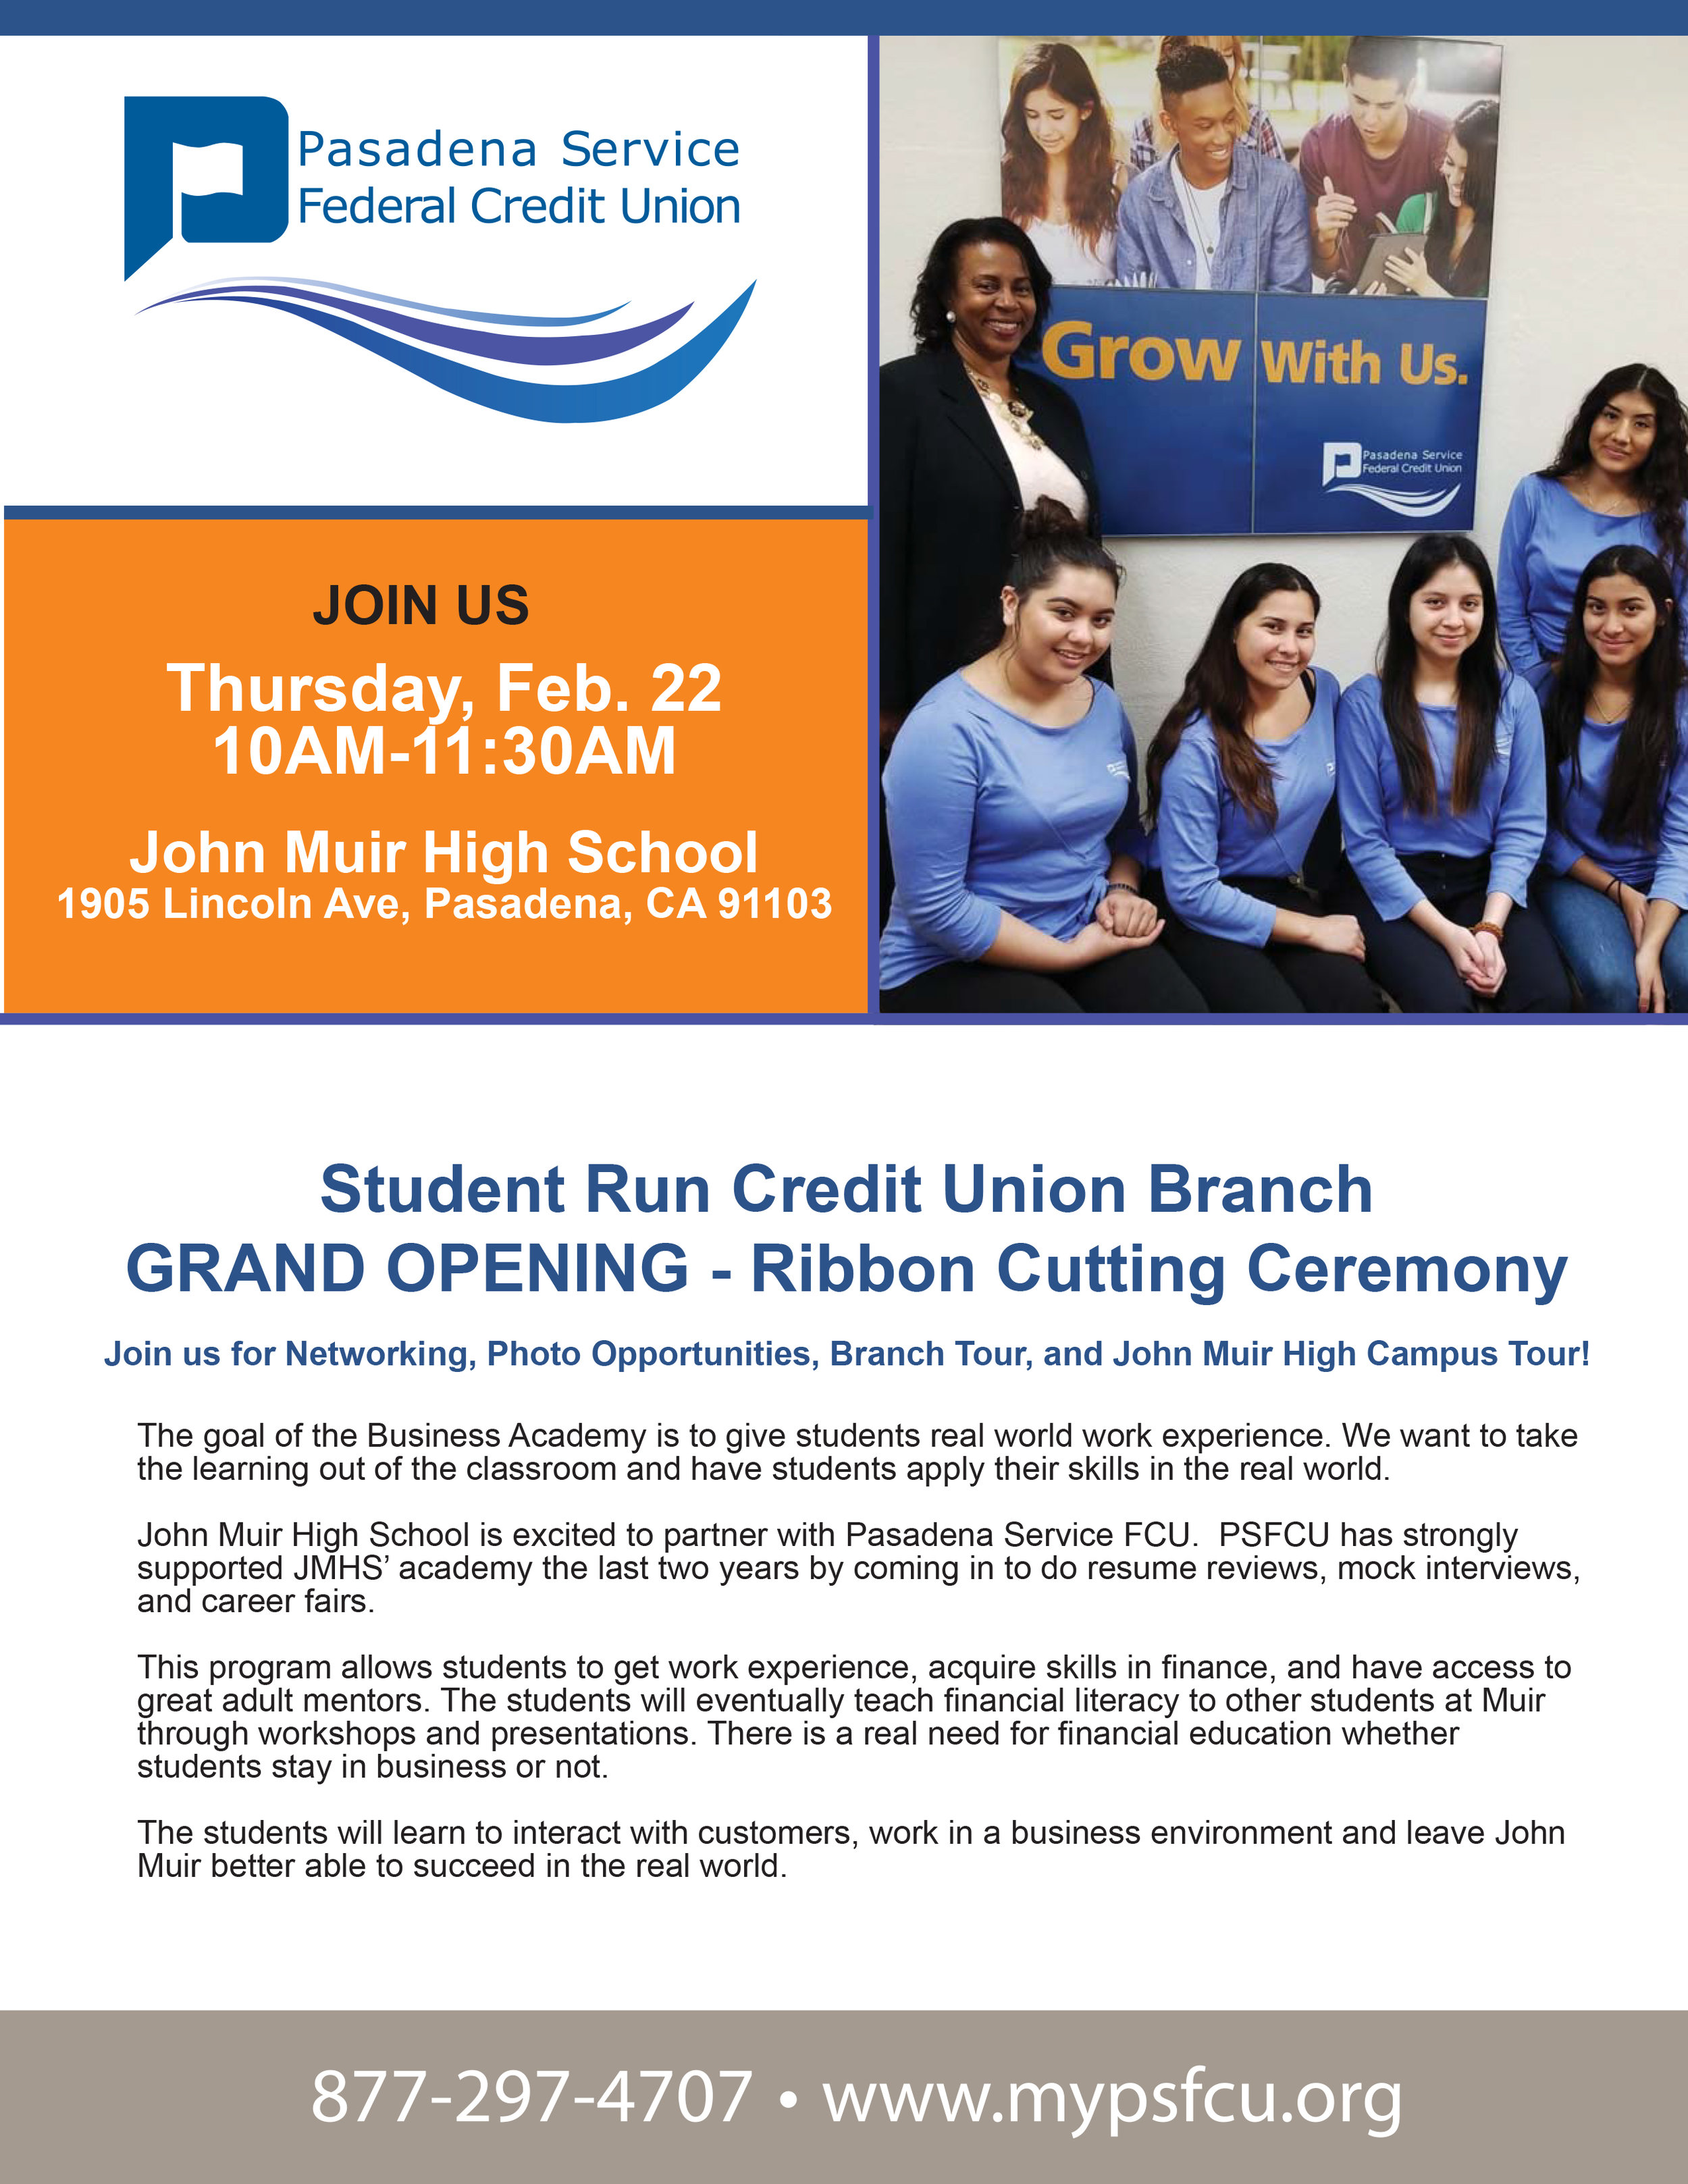 Pasadena Service Federal Credit Union Grand Opening- John Muir High School - February 22nd, 2018